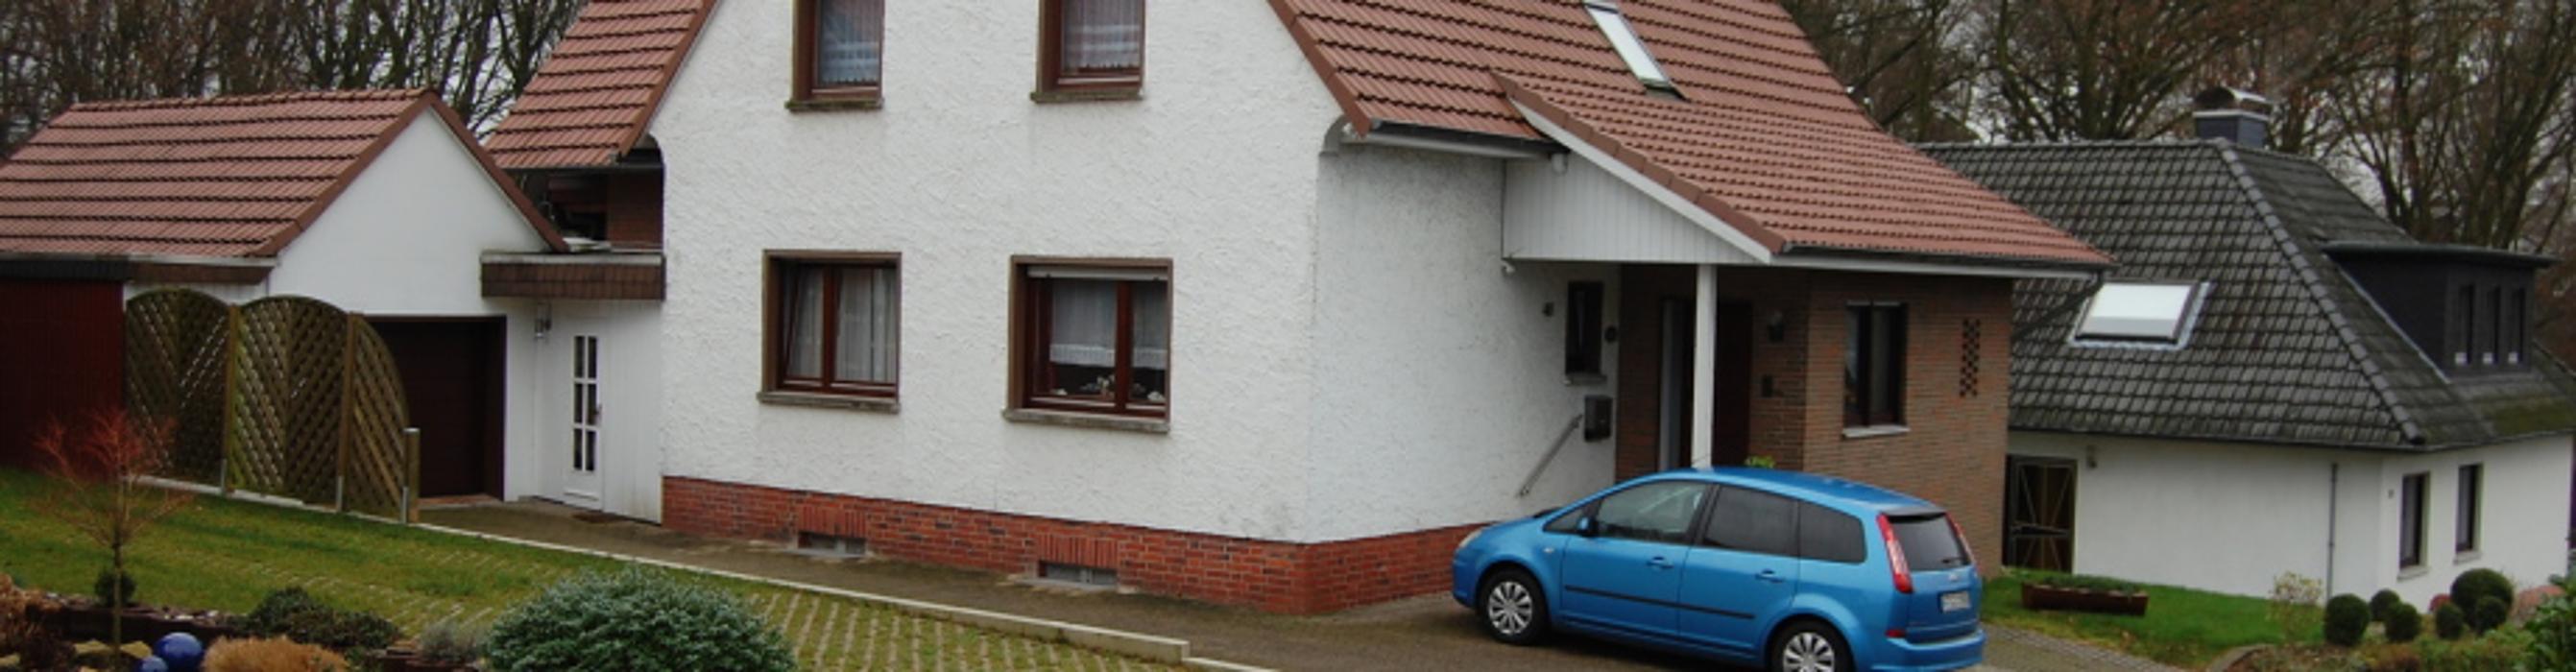 pension zurheide porta westfalica kiekenbrink 40. Black Bedroom Furniture Sets. Home Design Ideas